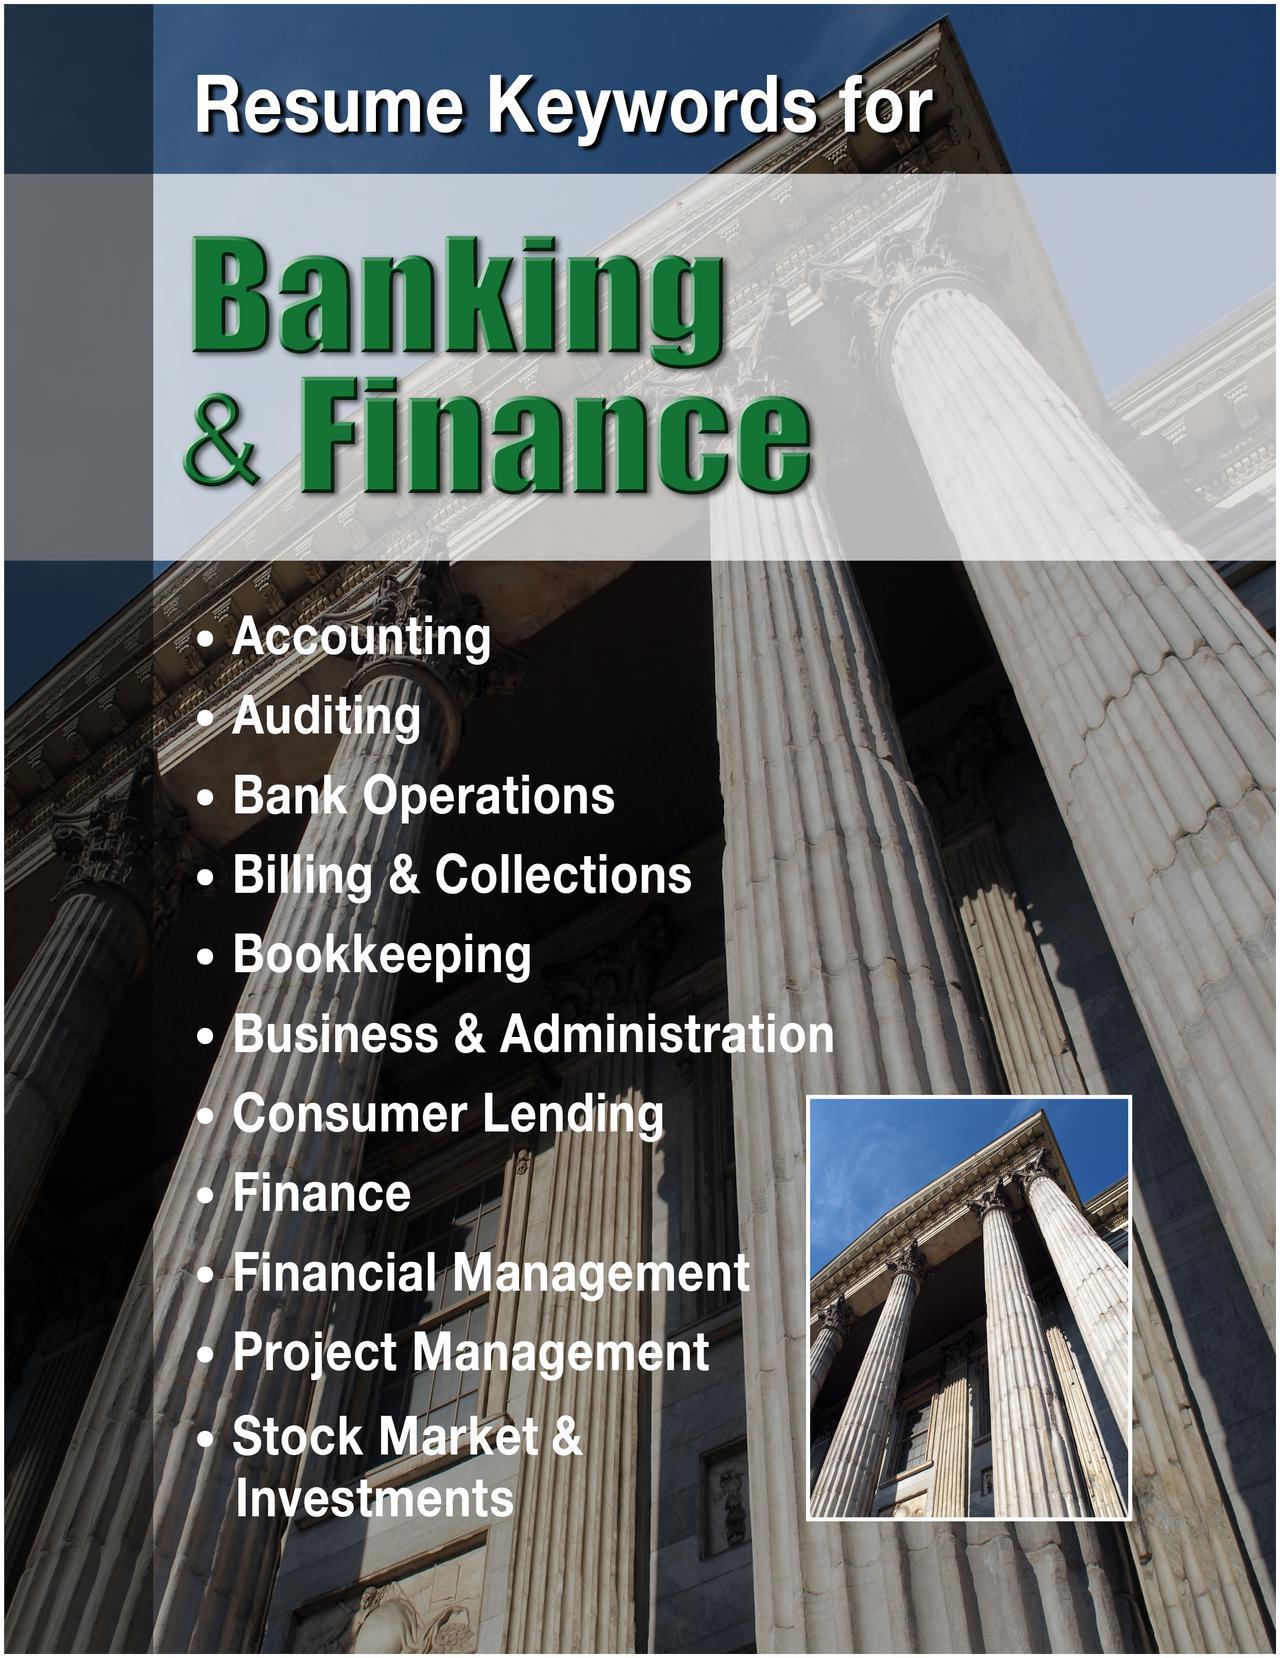 banking & finance divider.jpg